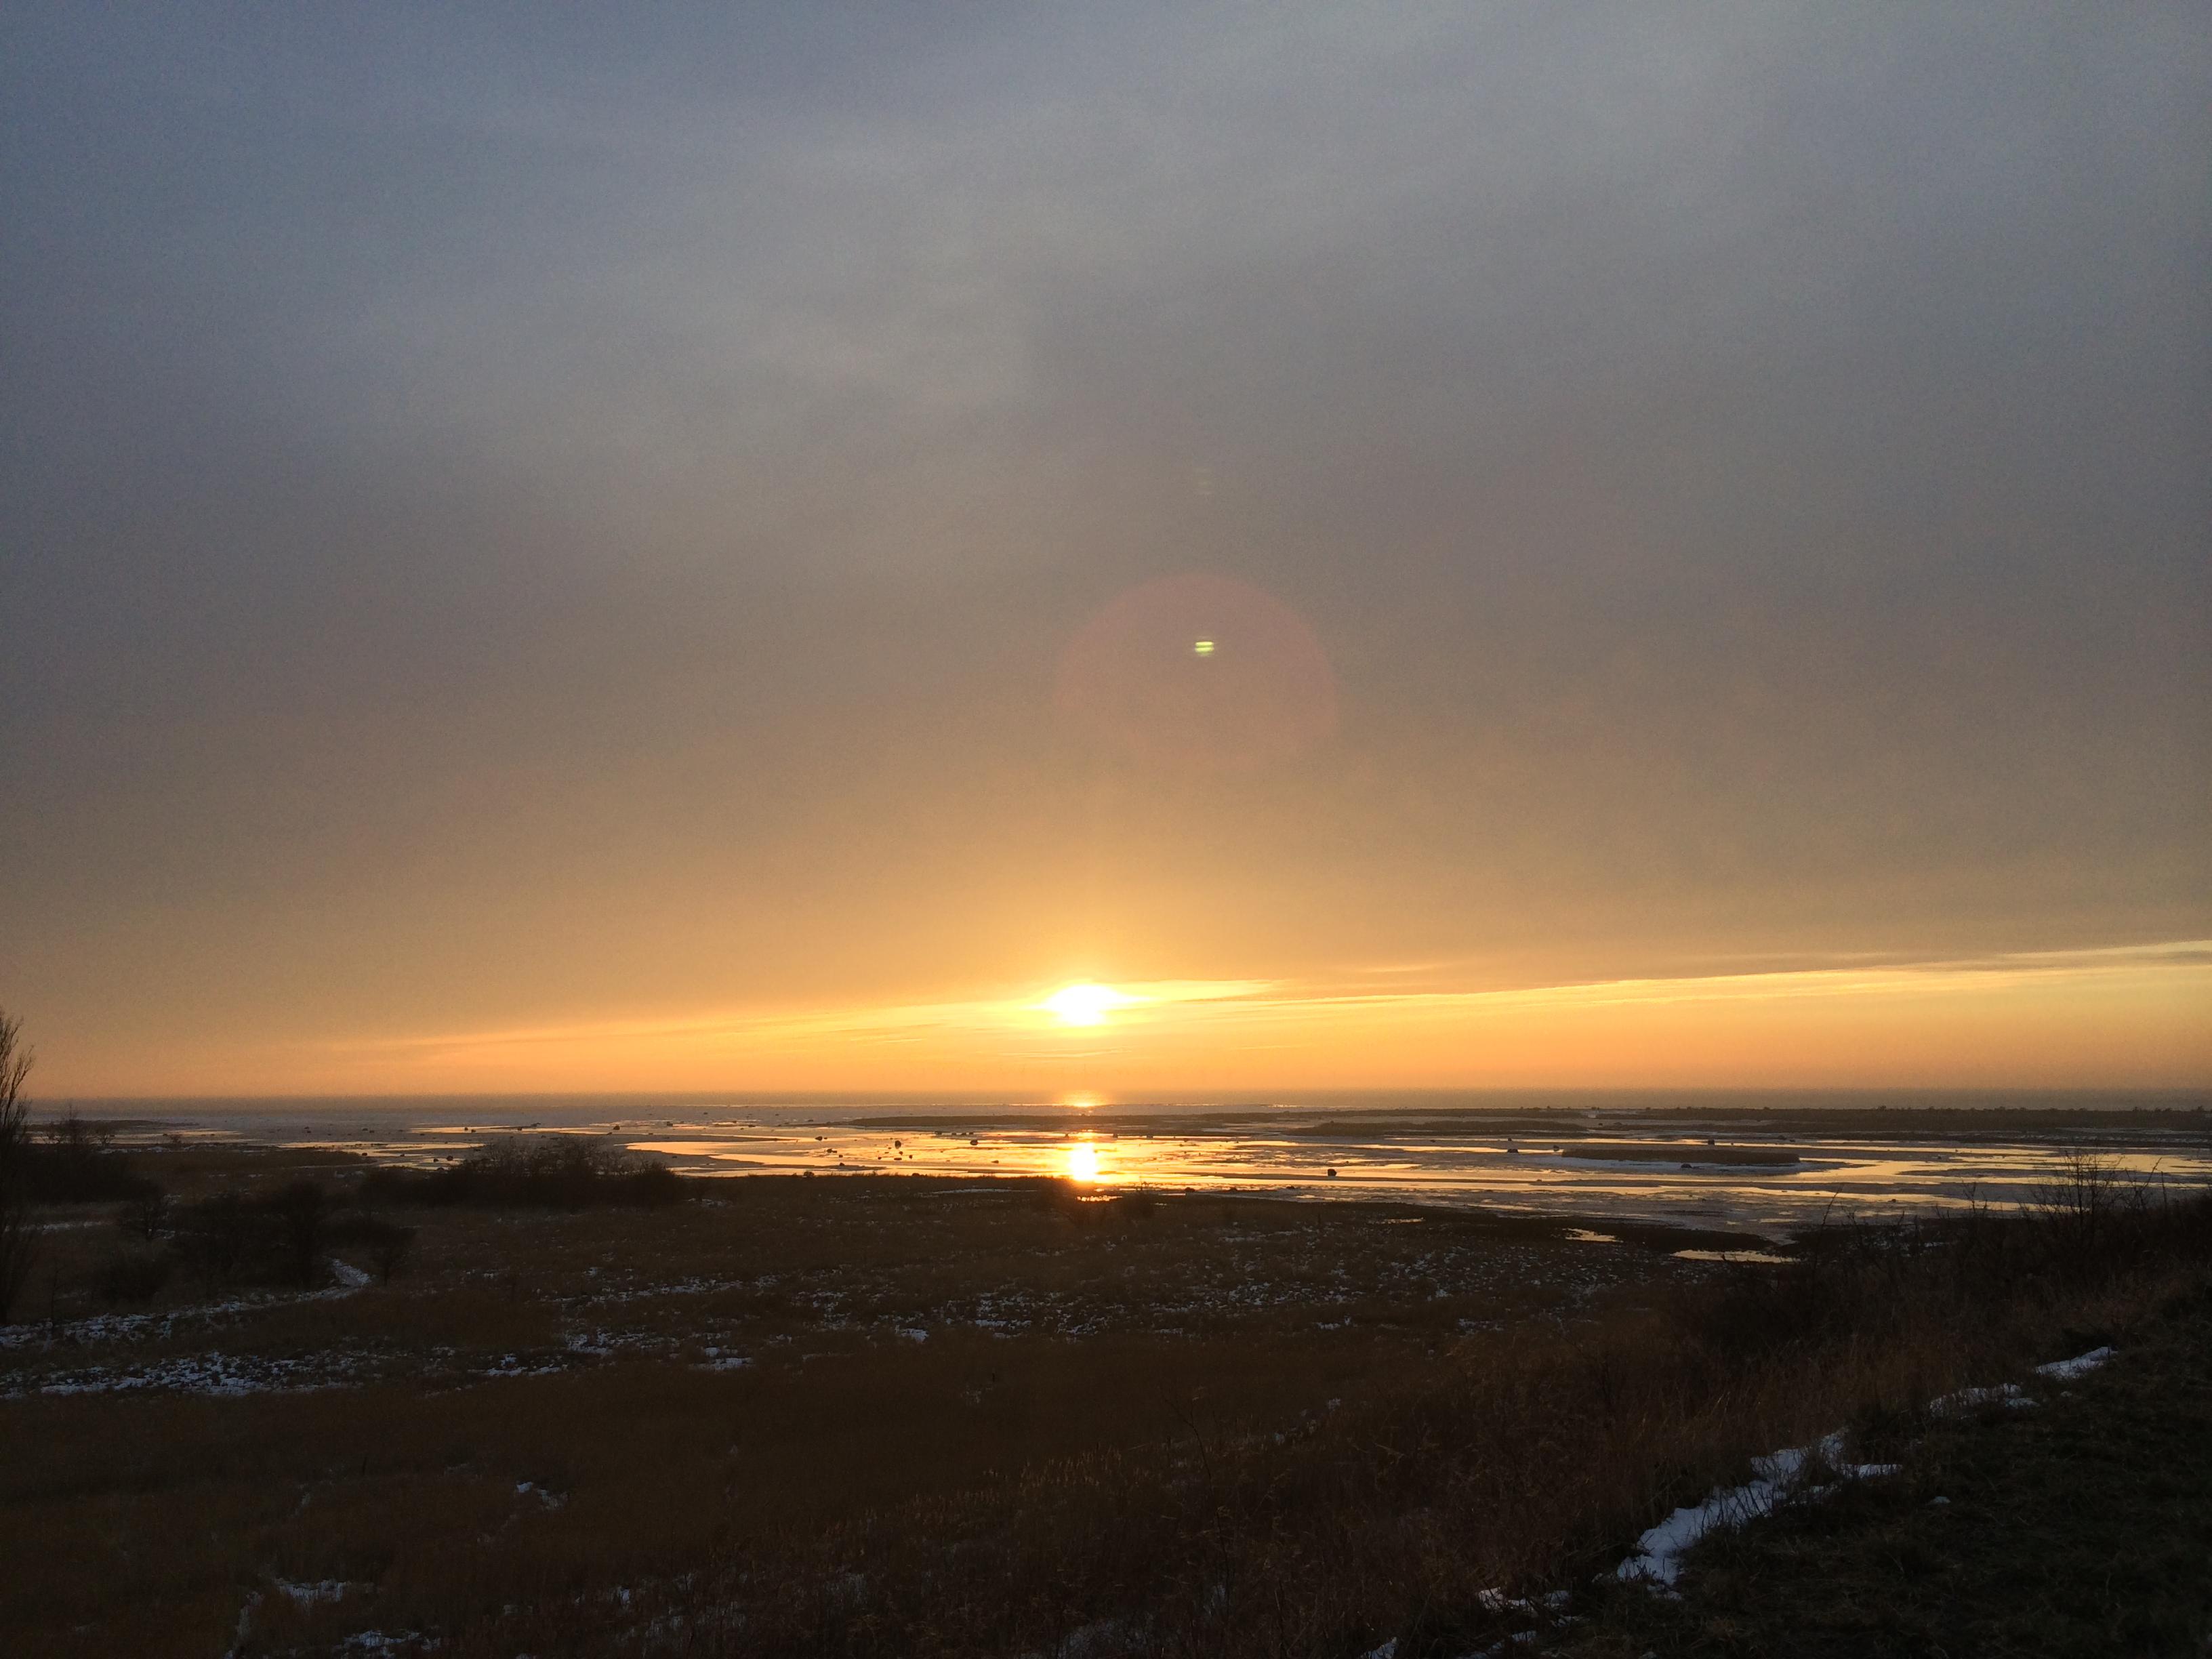 Eftermiddag i solnedgång